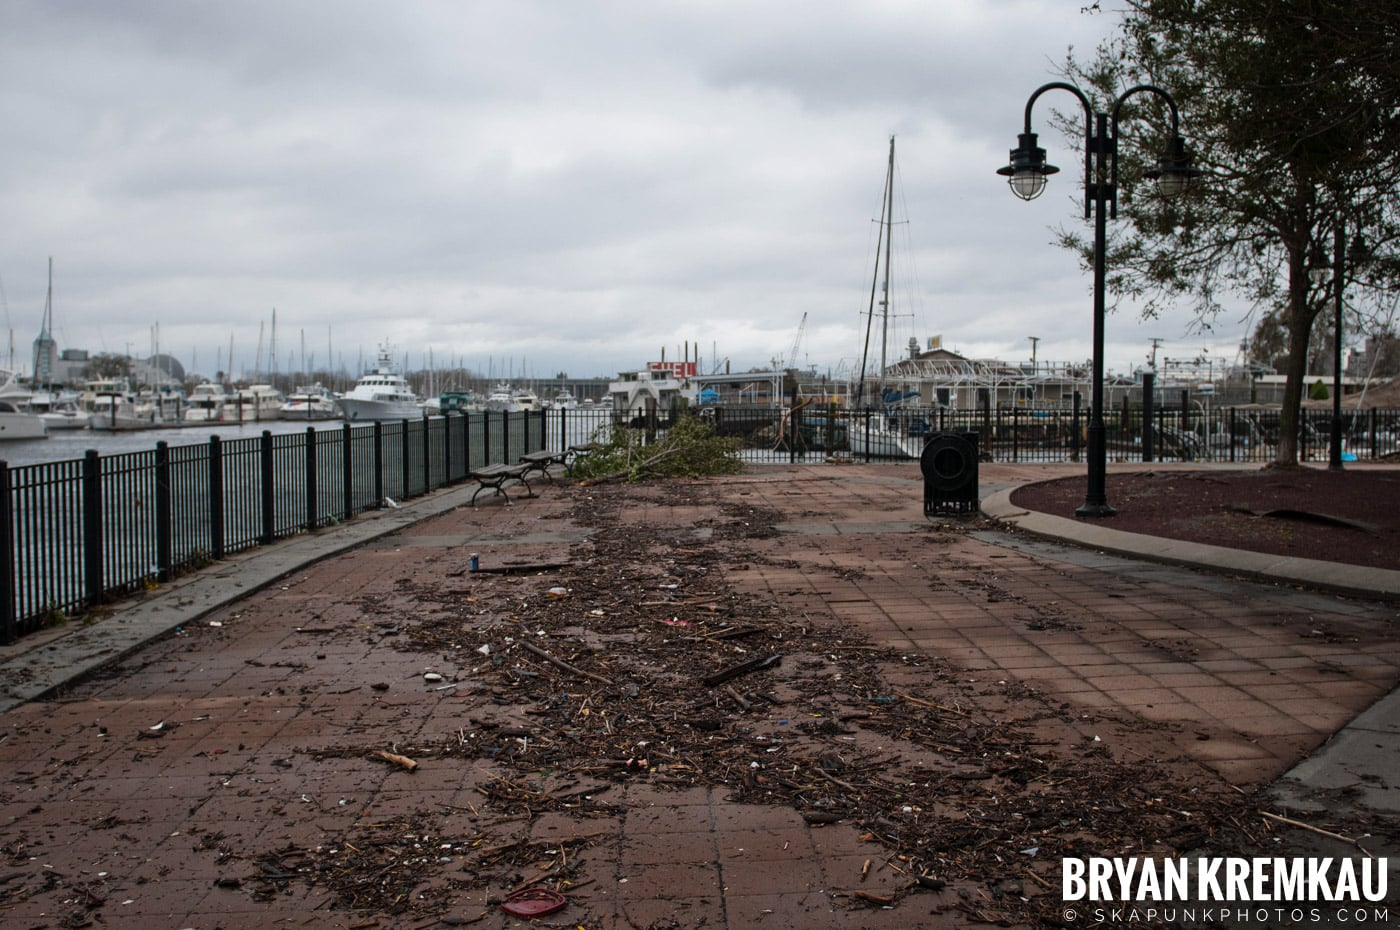 Hurricane Sandy 2012 @ Paulus Hook, Jersey City - 10.29.12 - 10.30.12 (23)